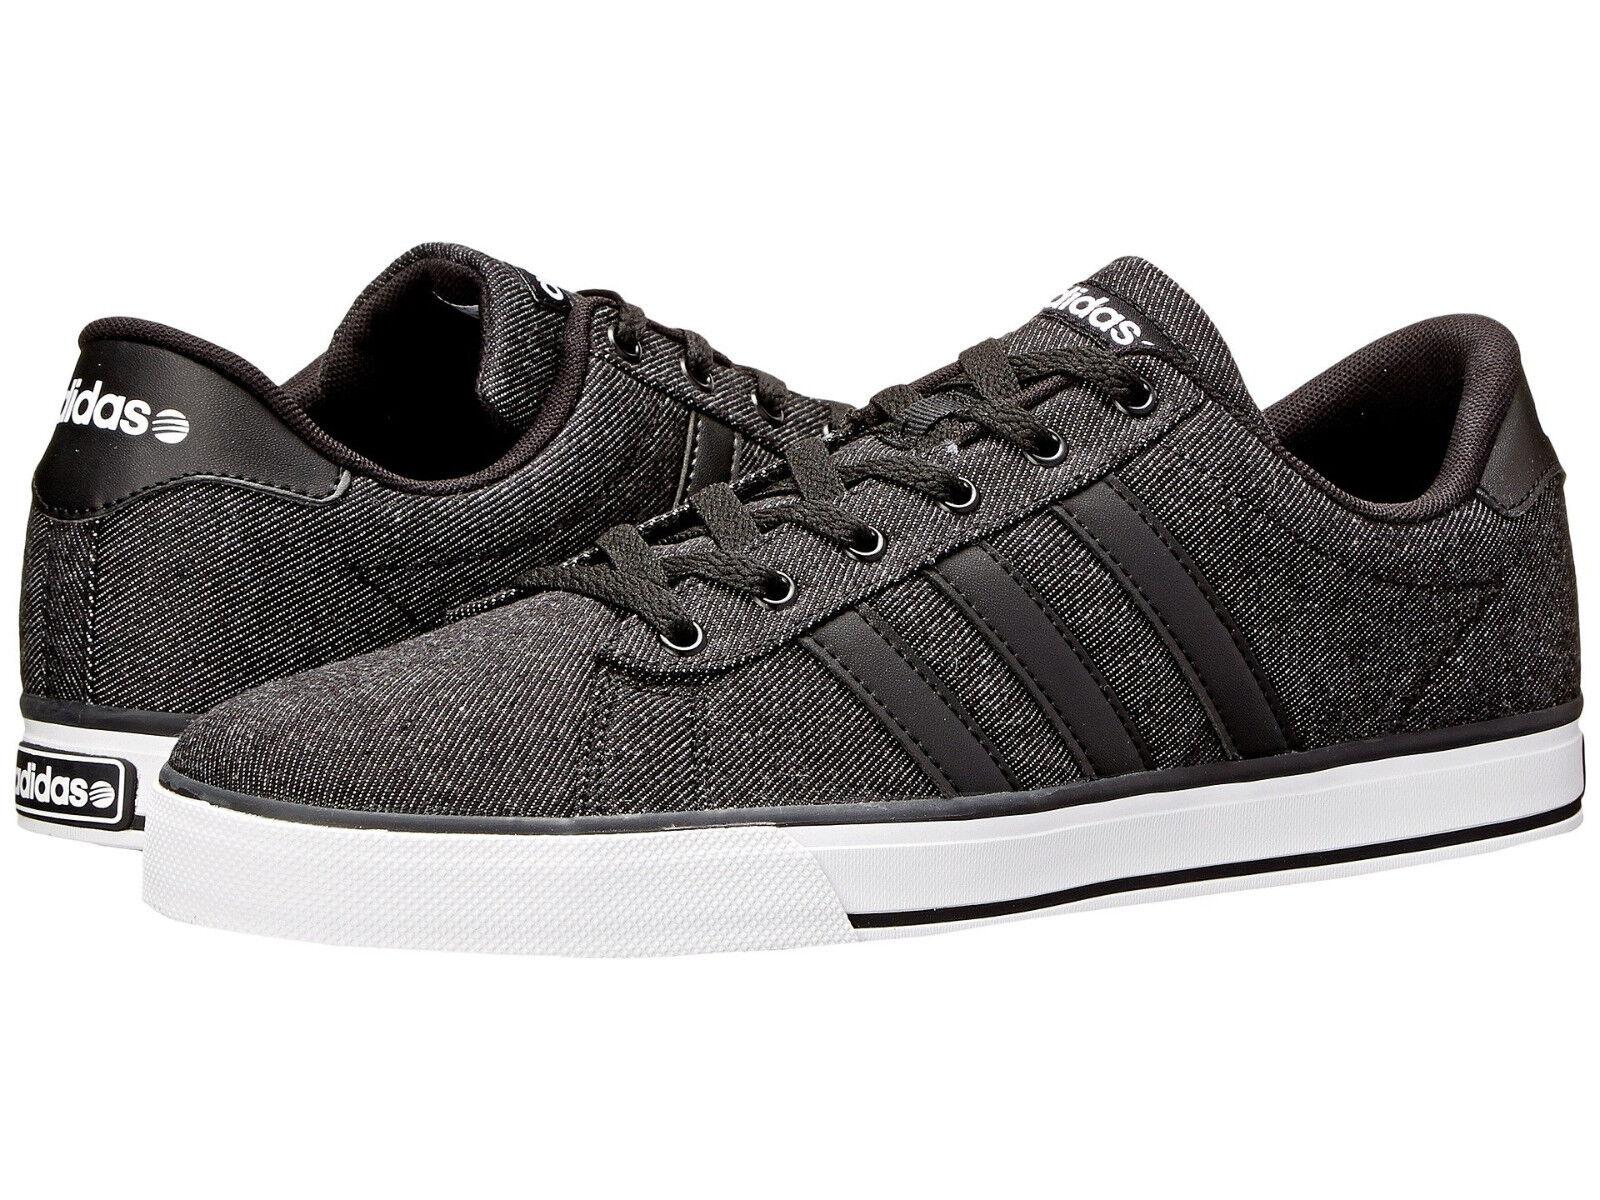 Men Adidas Se Daily Vulc Sneaker Canvas F76263 Black White 100% Authentic New